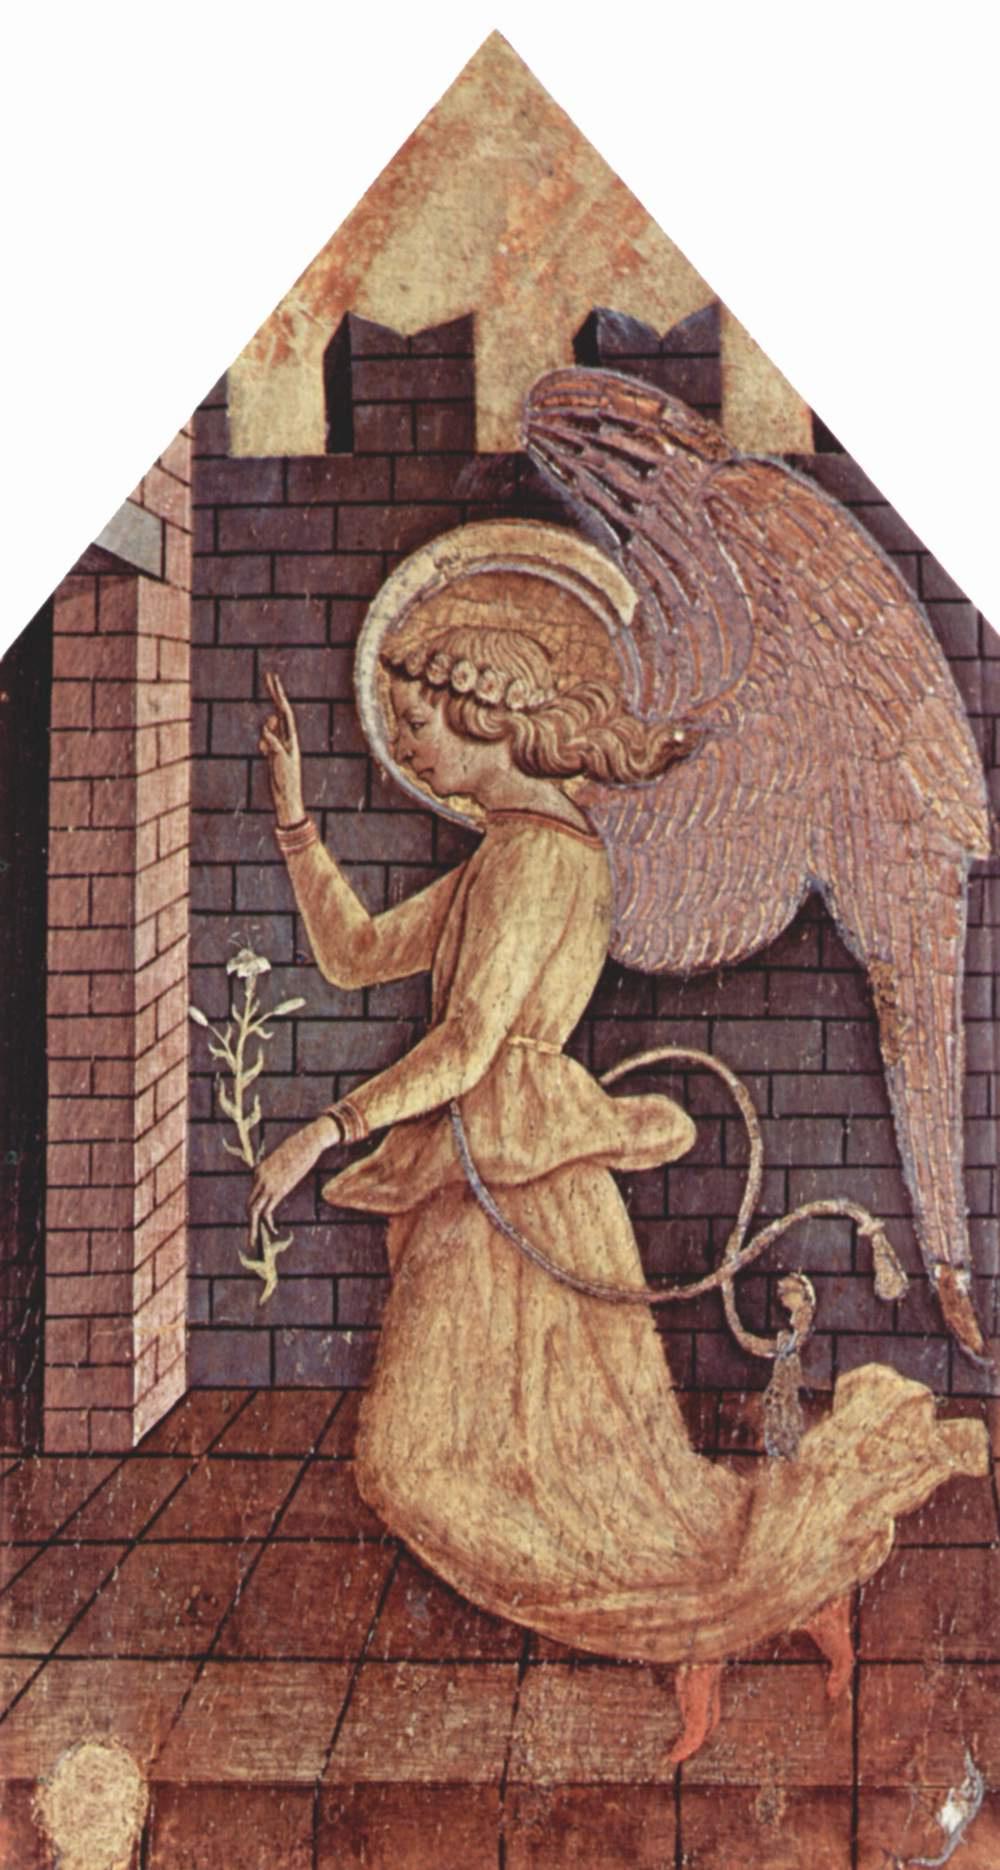 Carlo Crivelli. Archangel Gabriel. The altar of the Church of San Silvestro at Massa Fermanagh, right finial